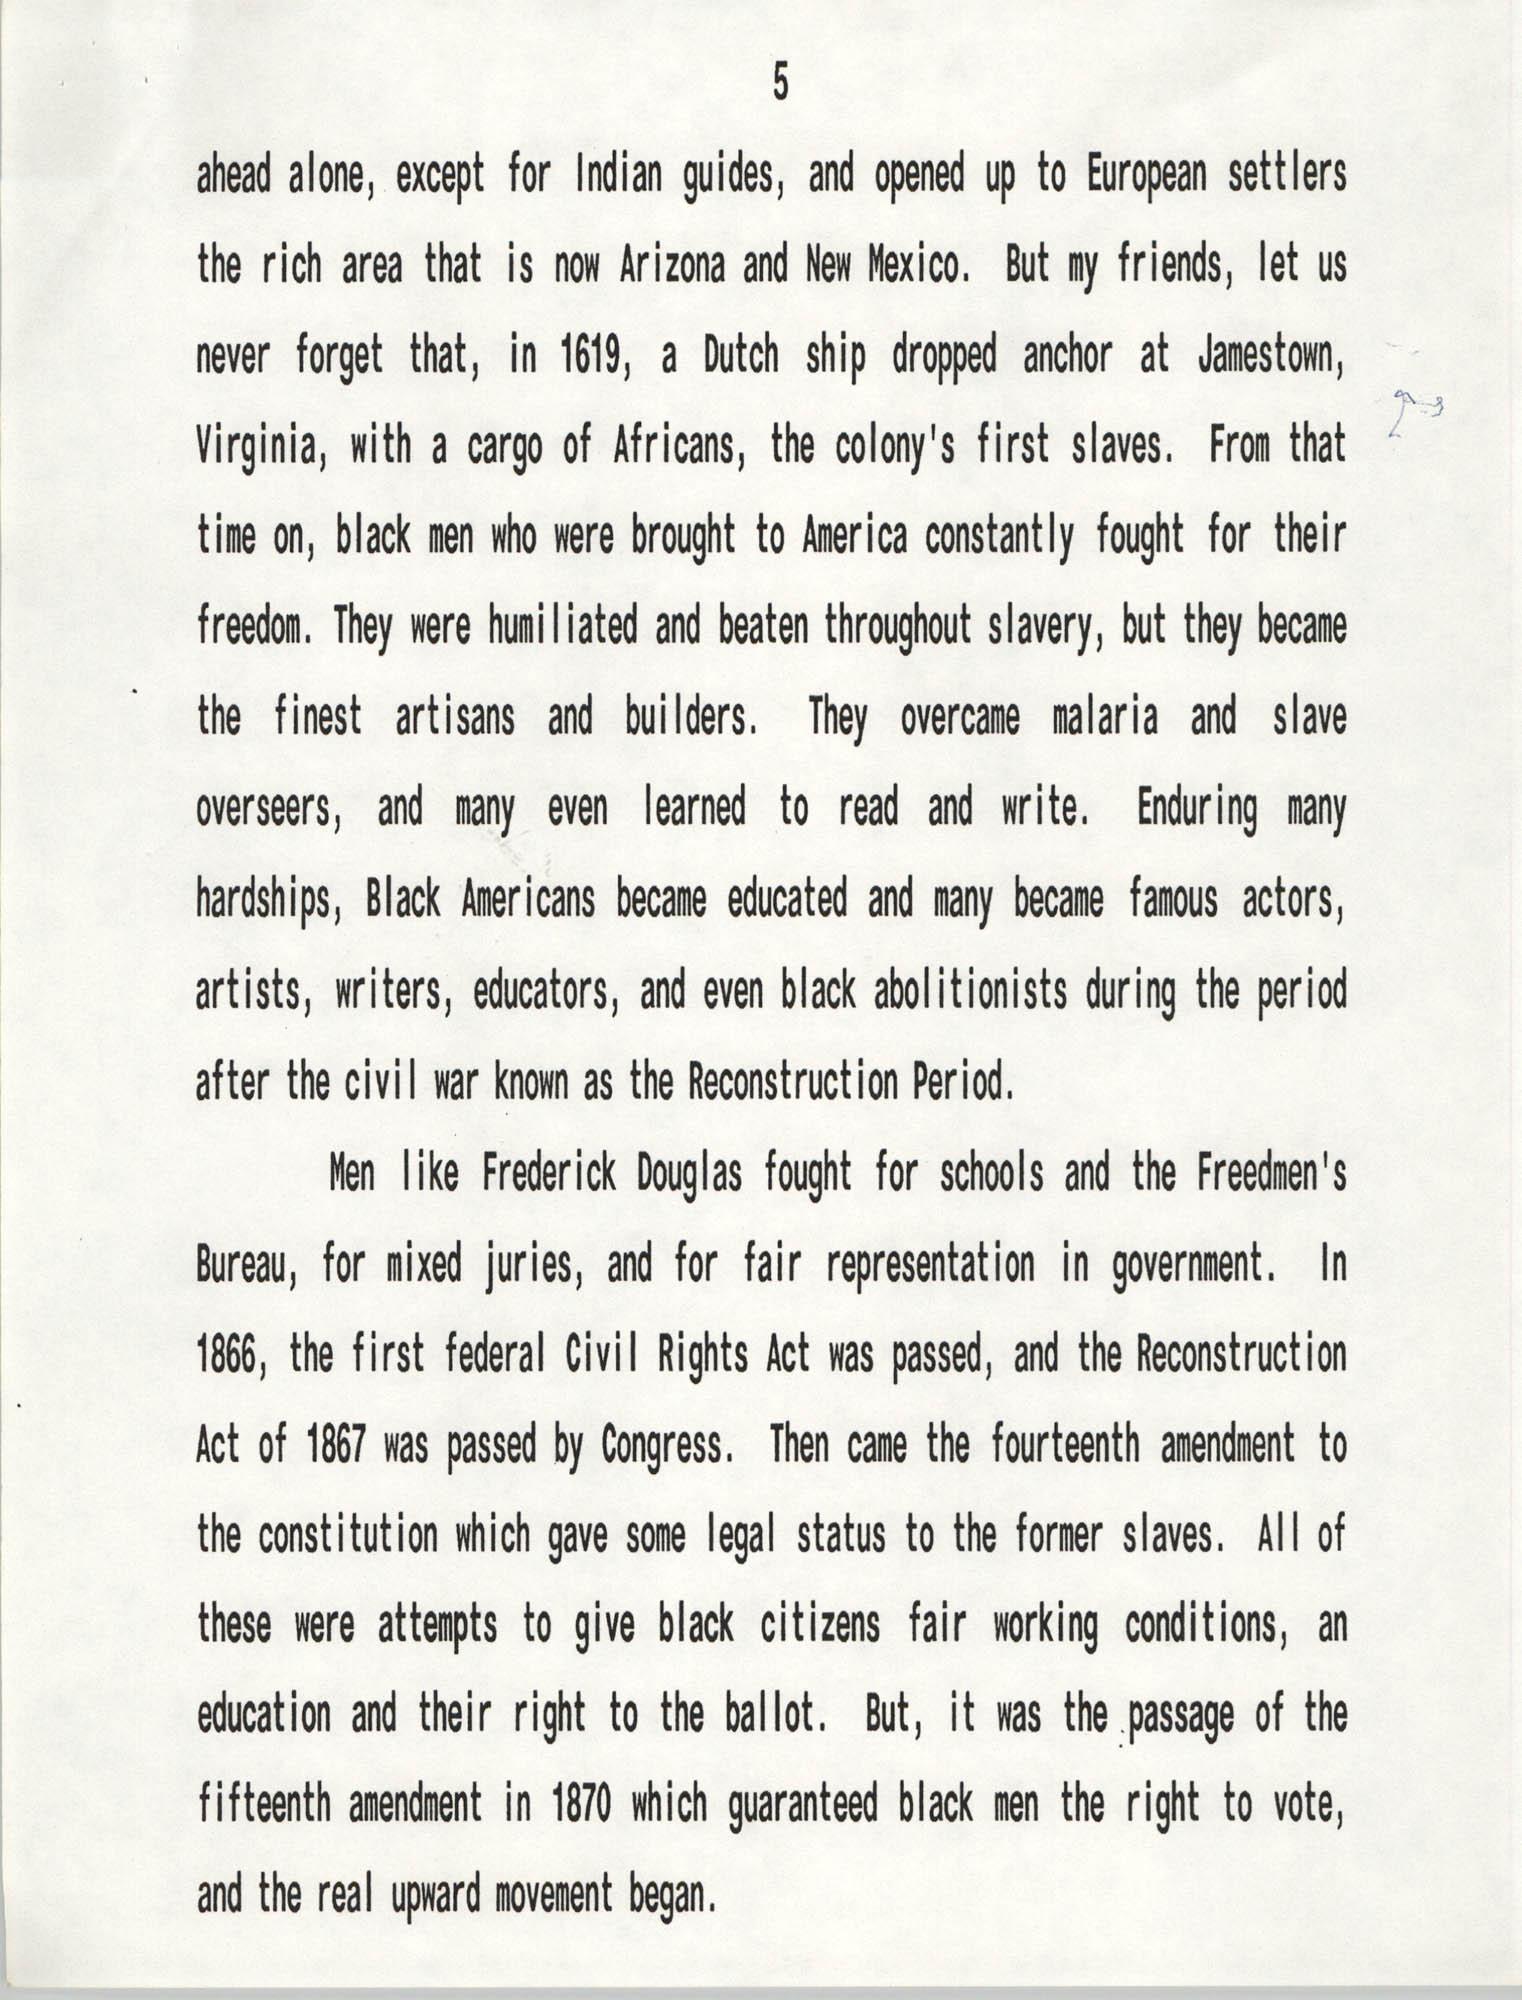 Senator Herbert U. Fielding, Black History Observance, February 28, 1988, Page 5